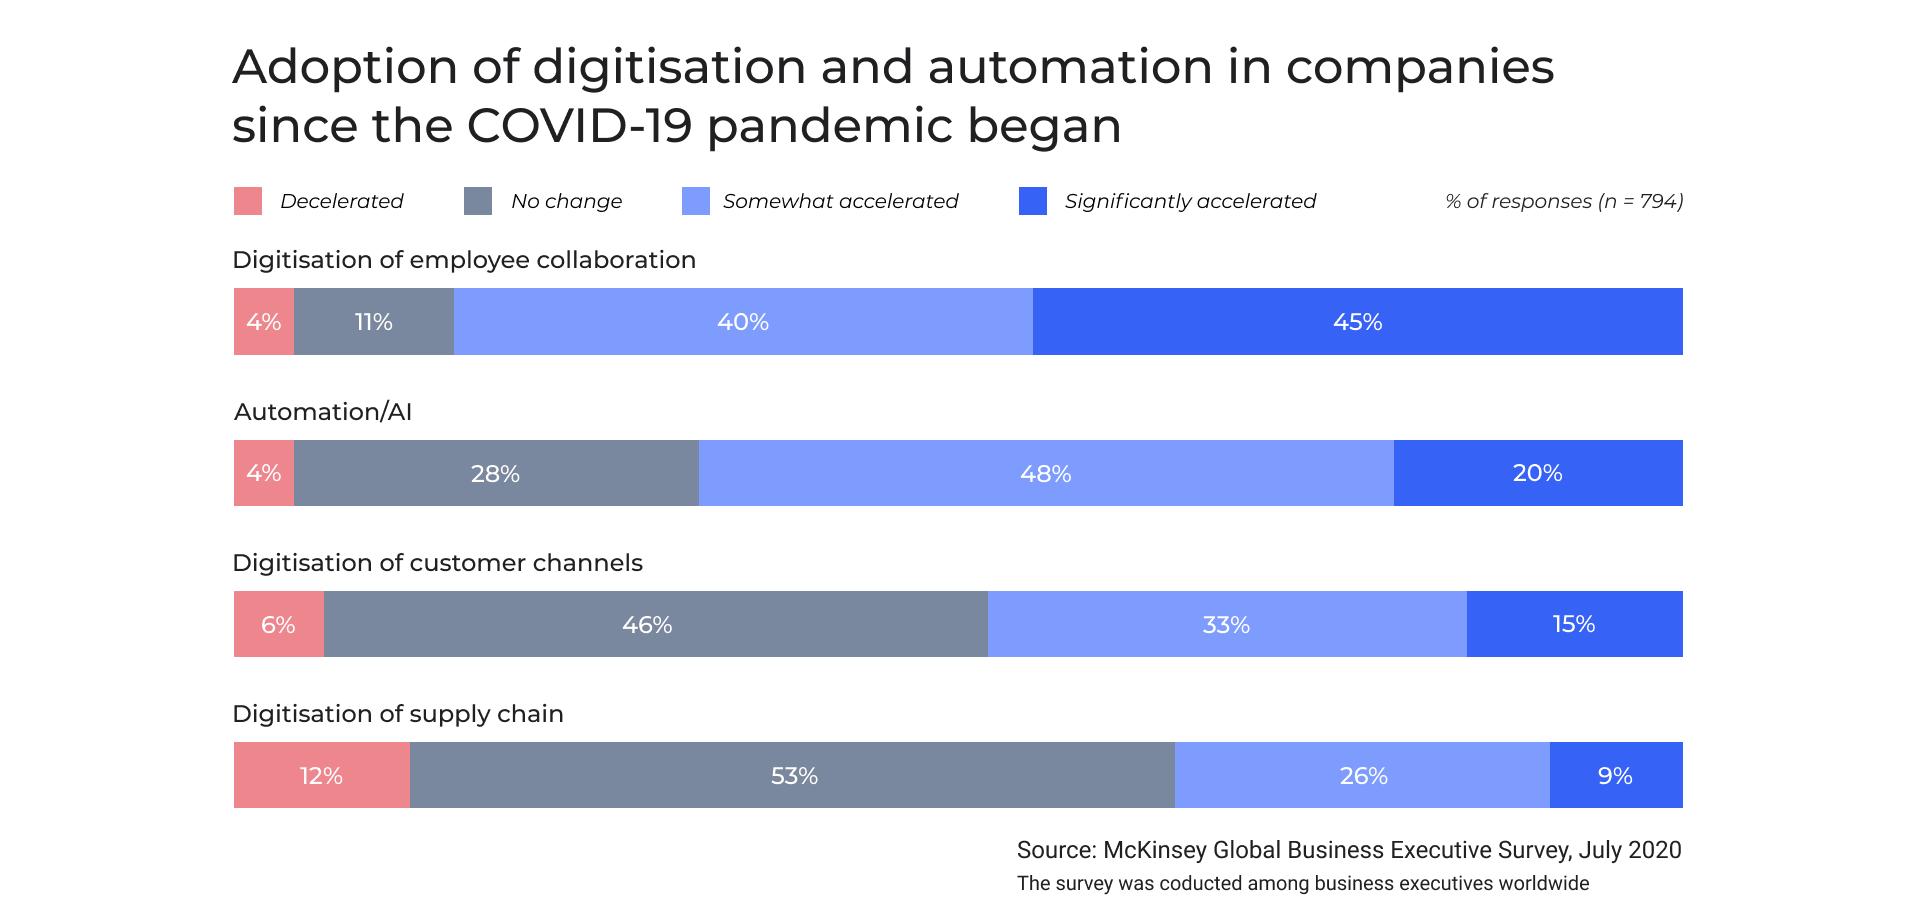 Digital transformation during COVID-19 pandemic